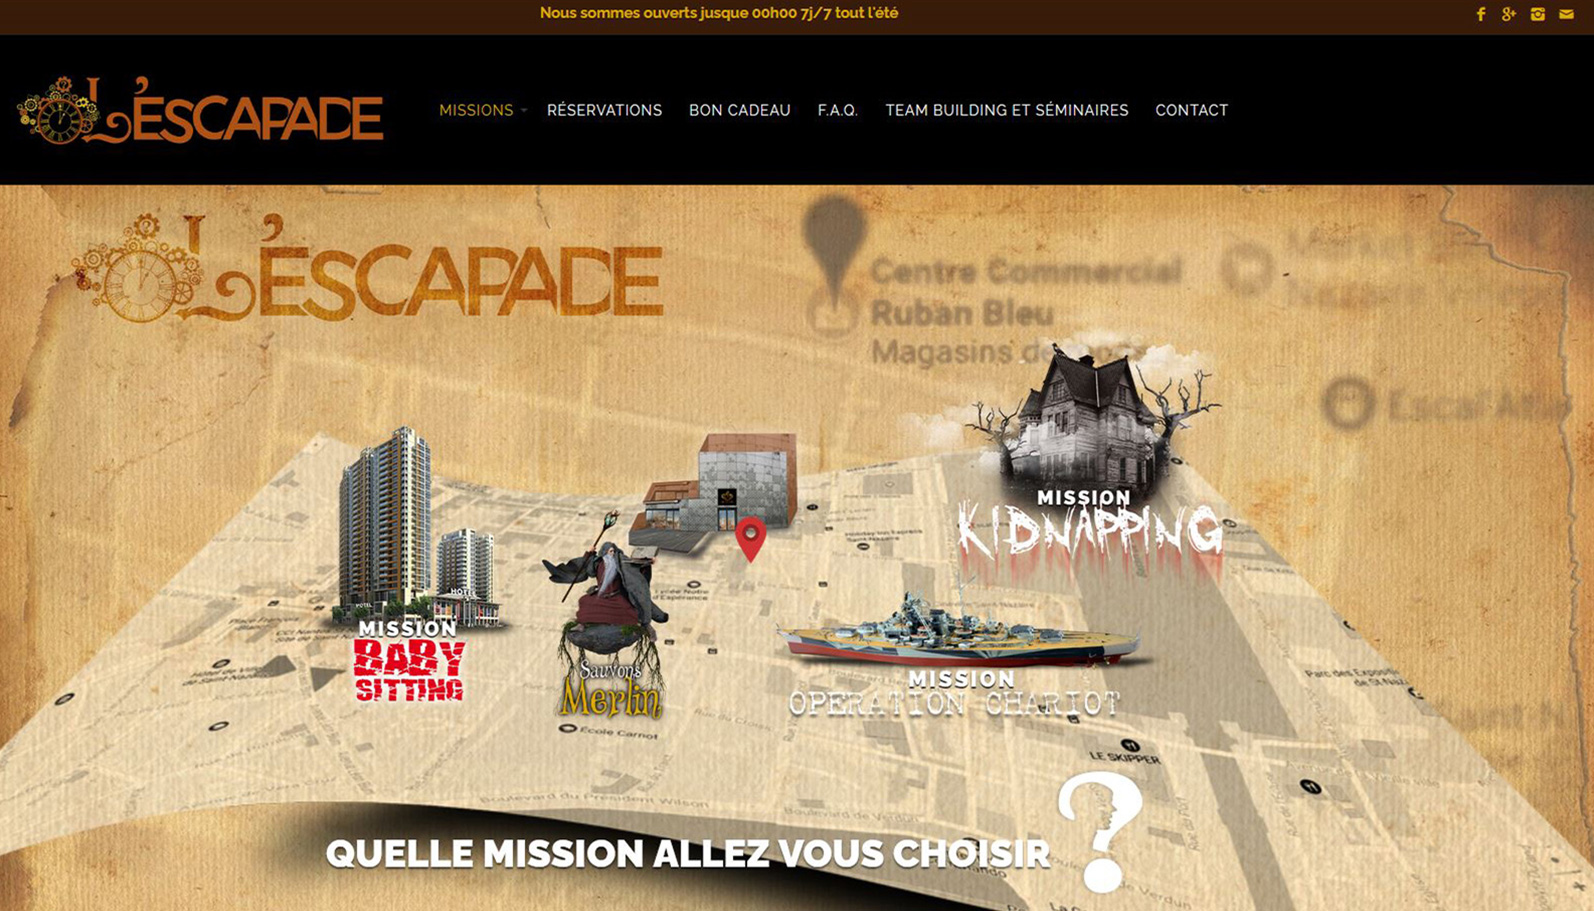 Visuel plan des missions L'Escapade